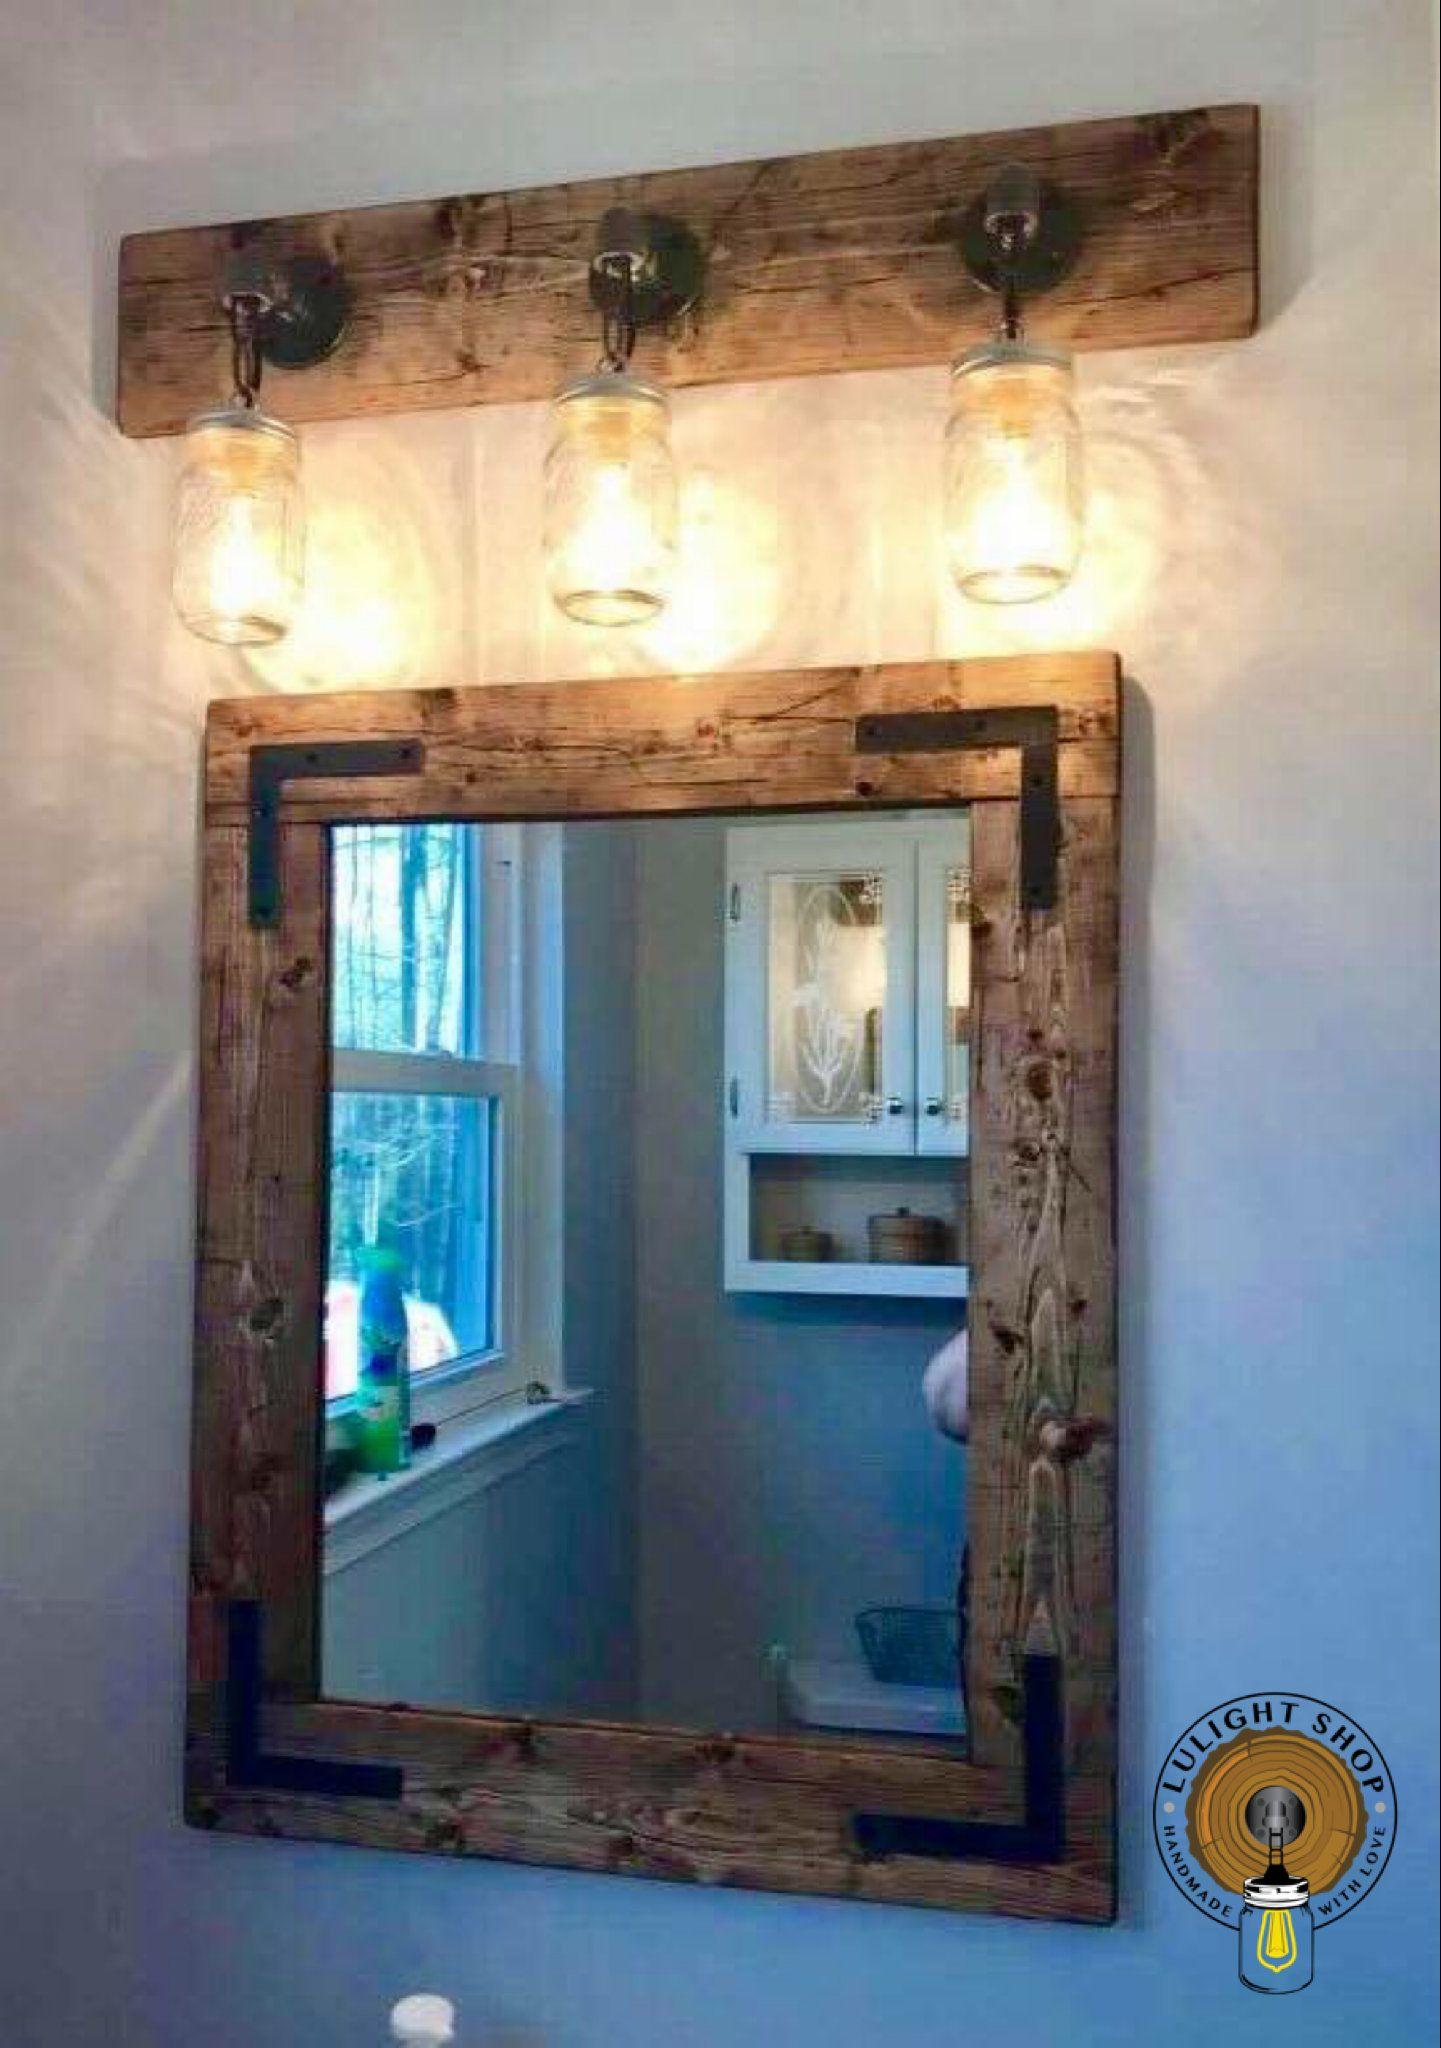 Rustic Distressed Bathroom Light Bathroom Decor Light For Bathroom Vanity Mason Jar Light Industrial P In 2020 Farmhouse Mirrors Rustic Bathrooms Diy Vanity Mirror